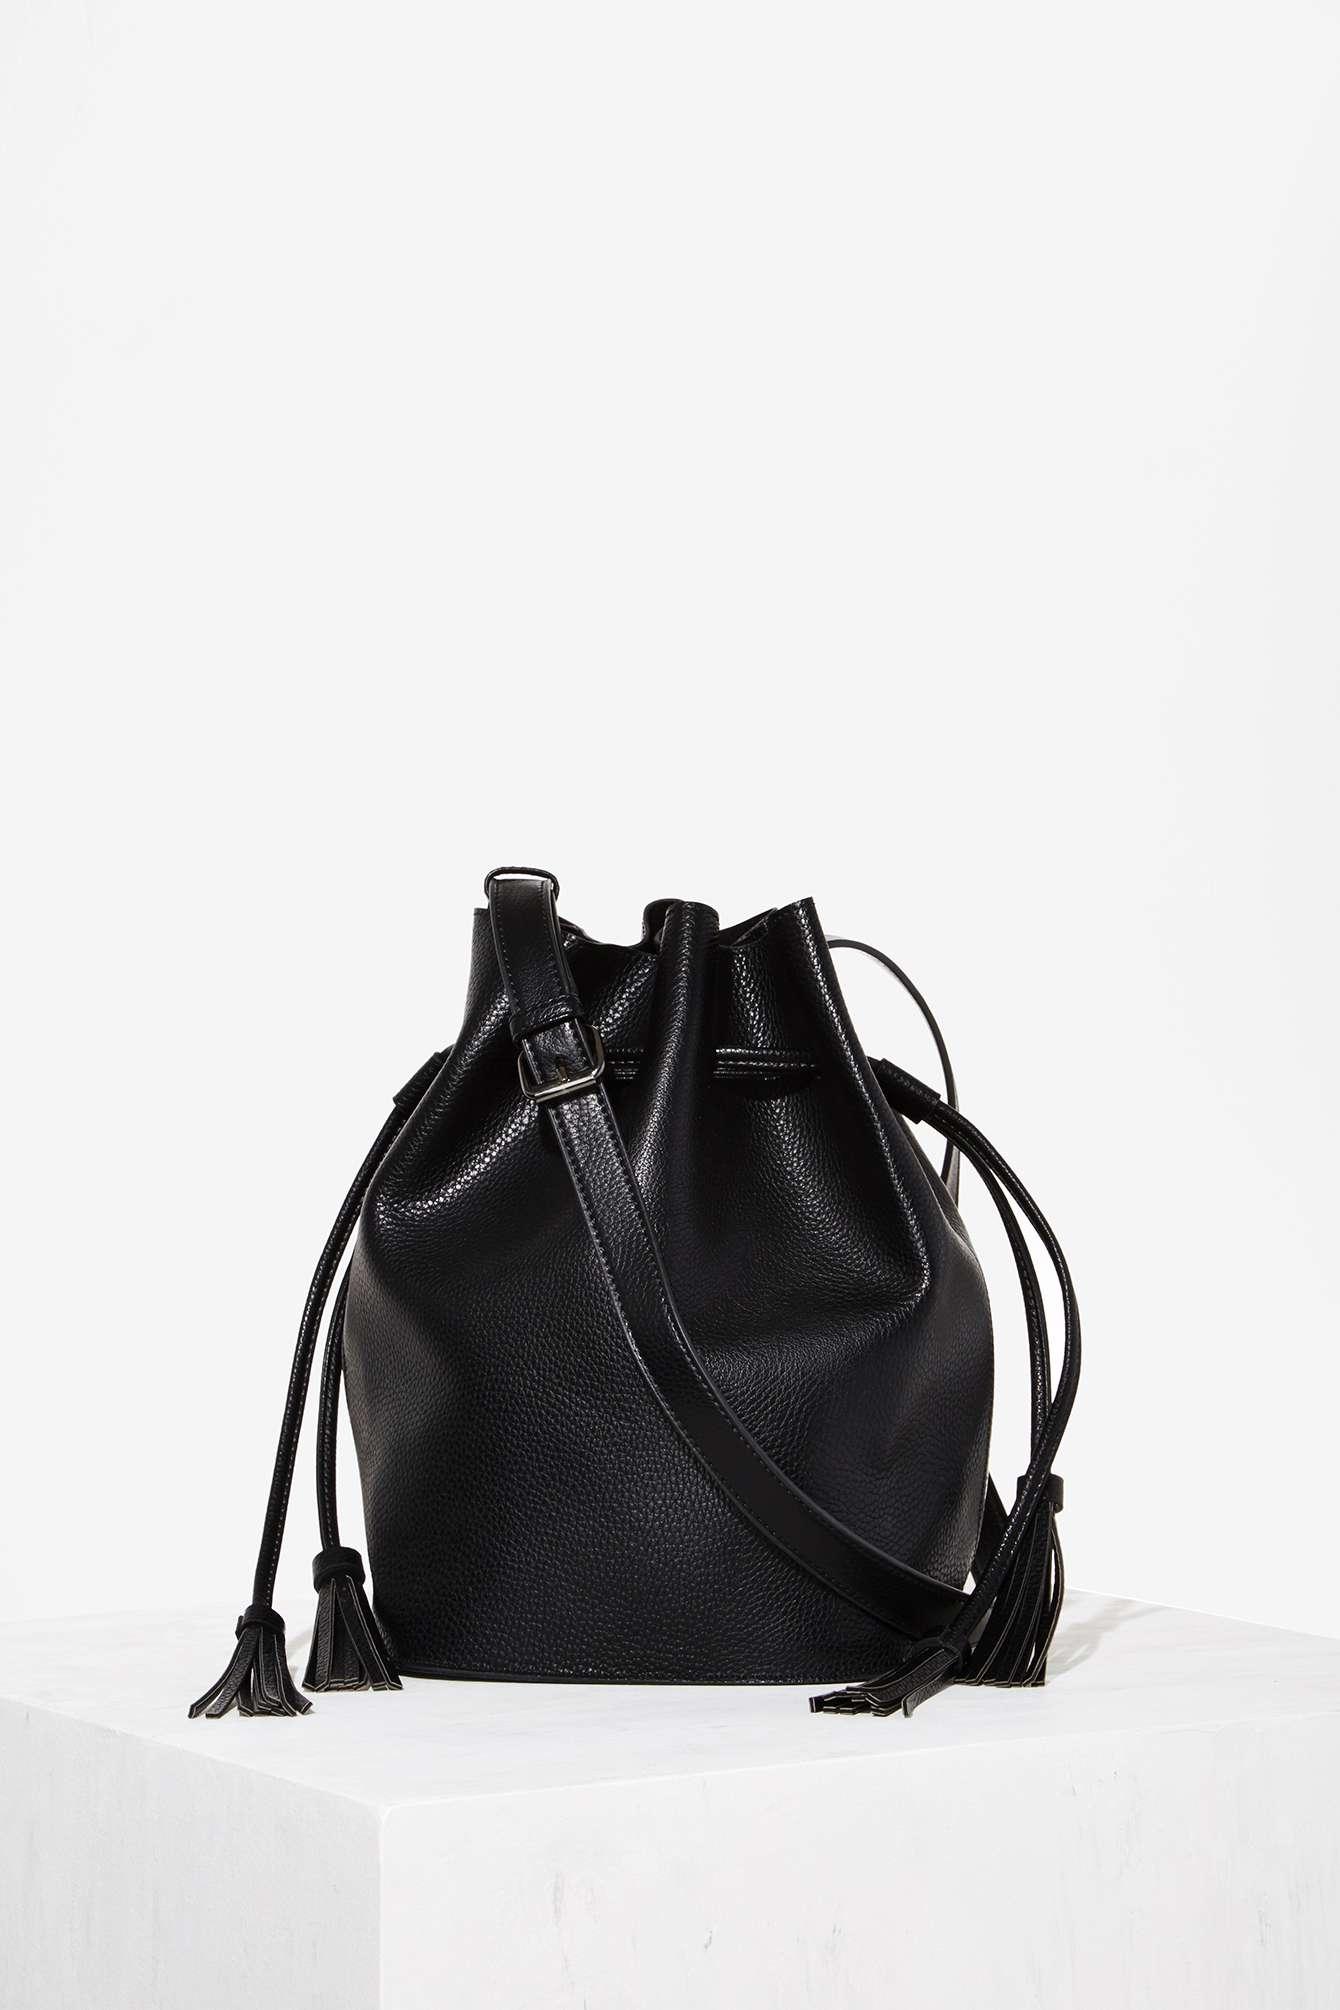 eebcf385e12b Lyst - Nasty Gal Lizzie Tassel Bucket Bag in Black